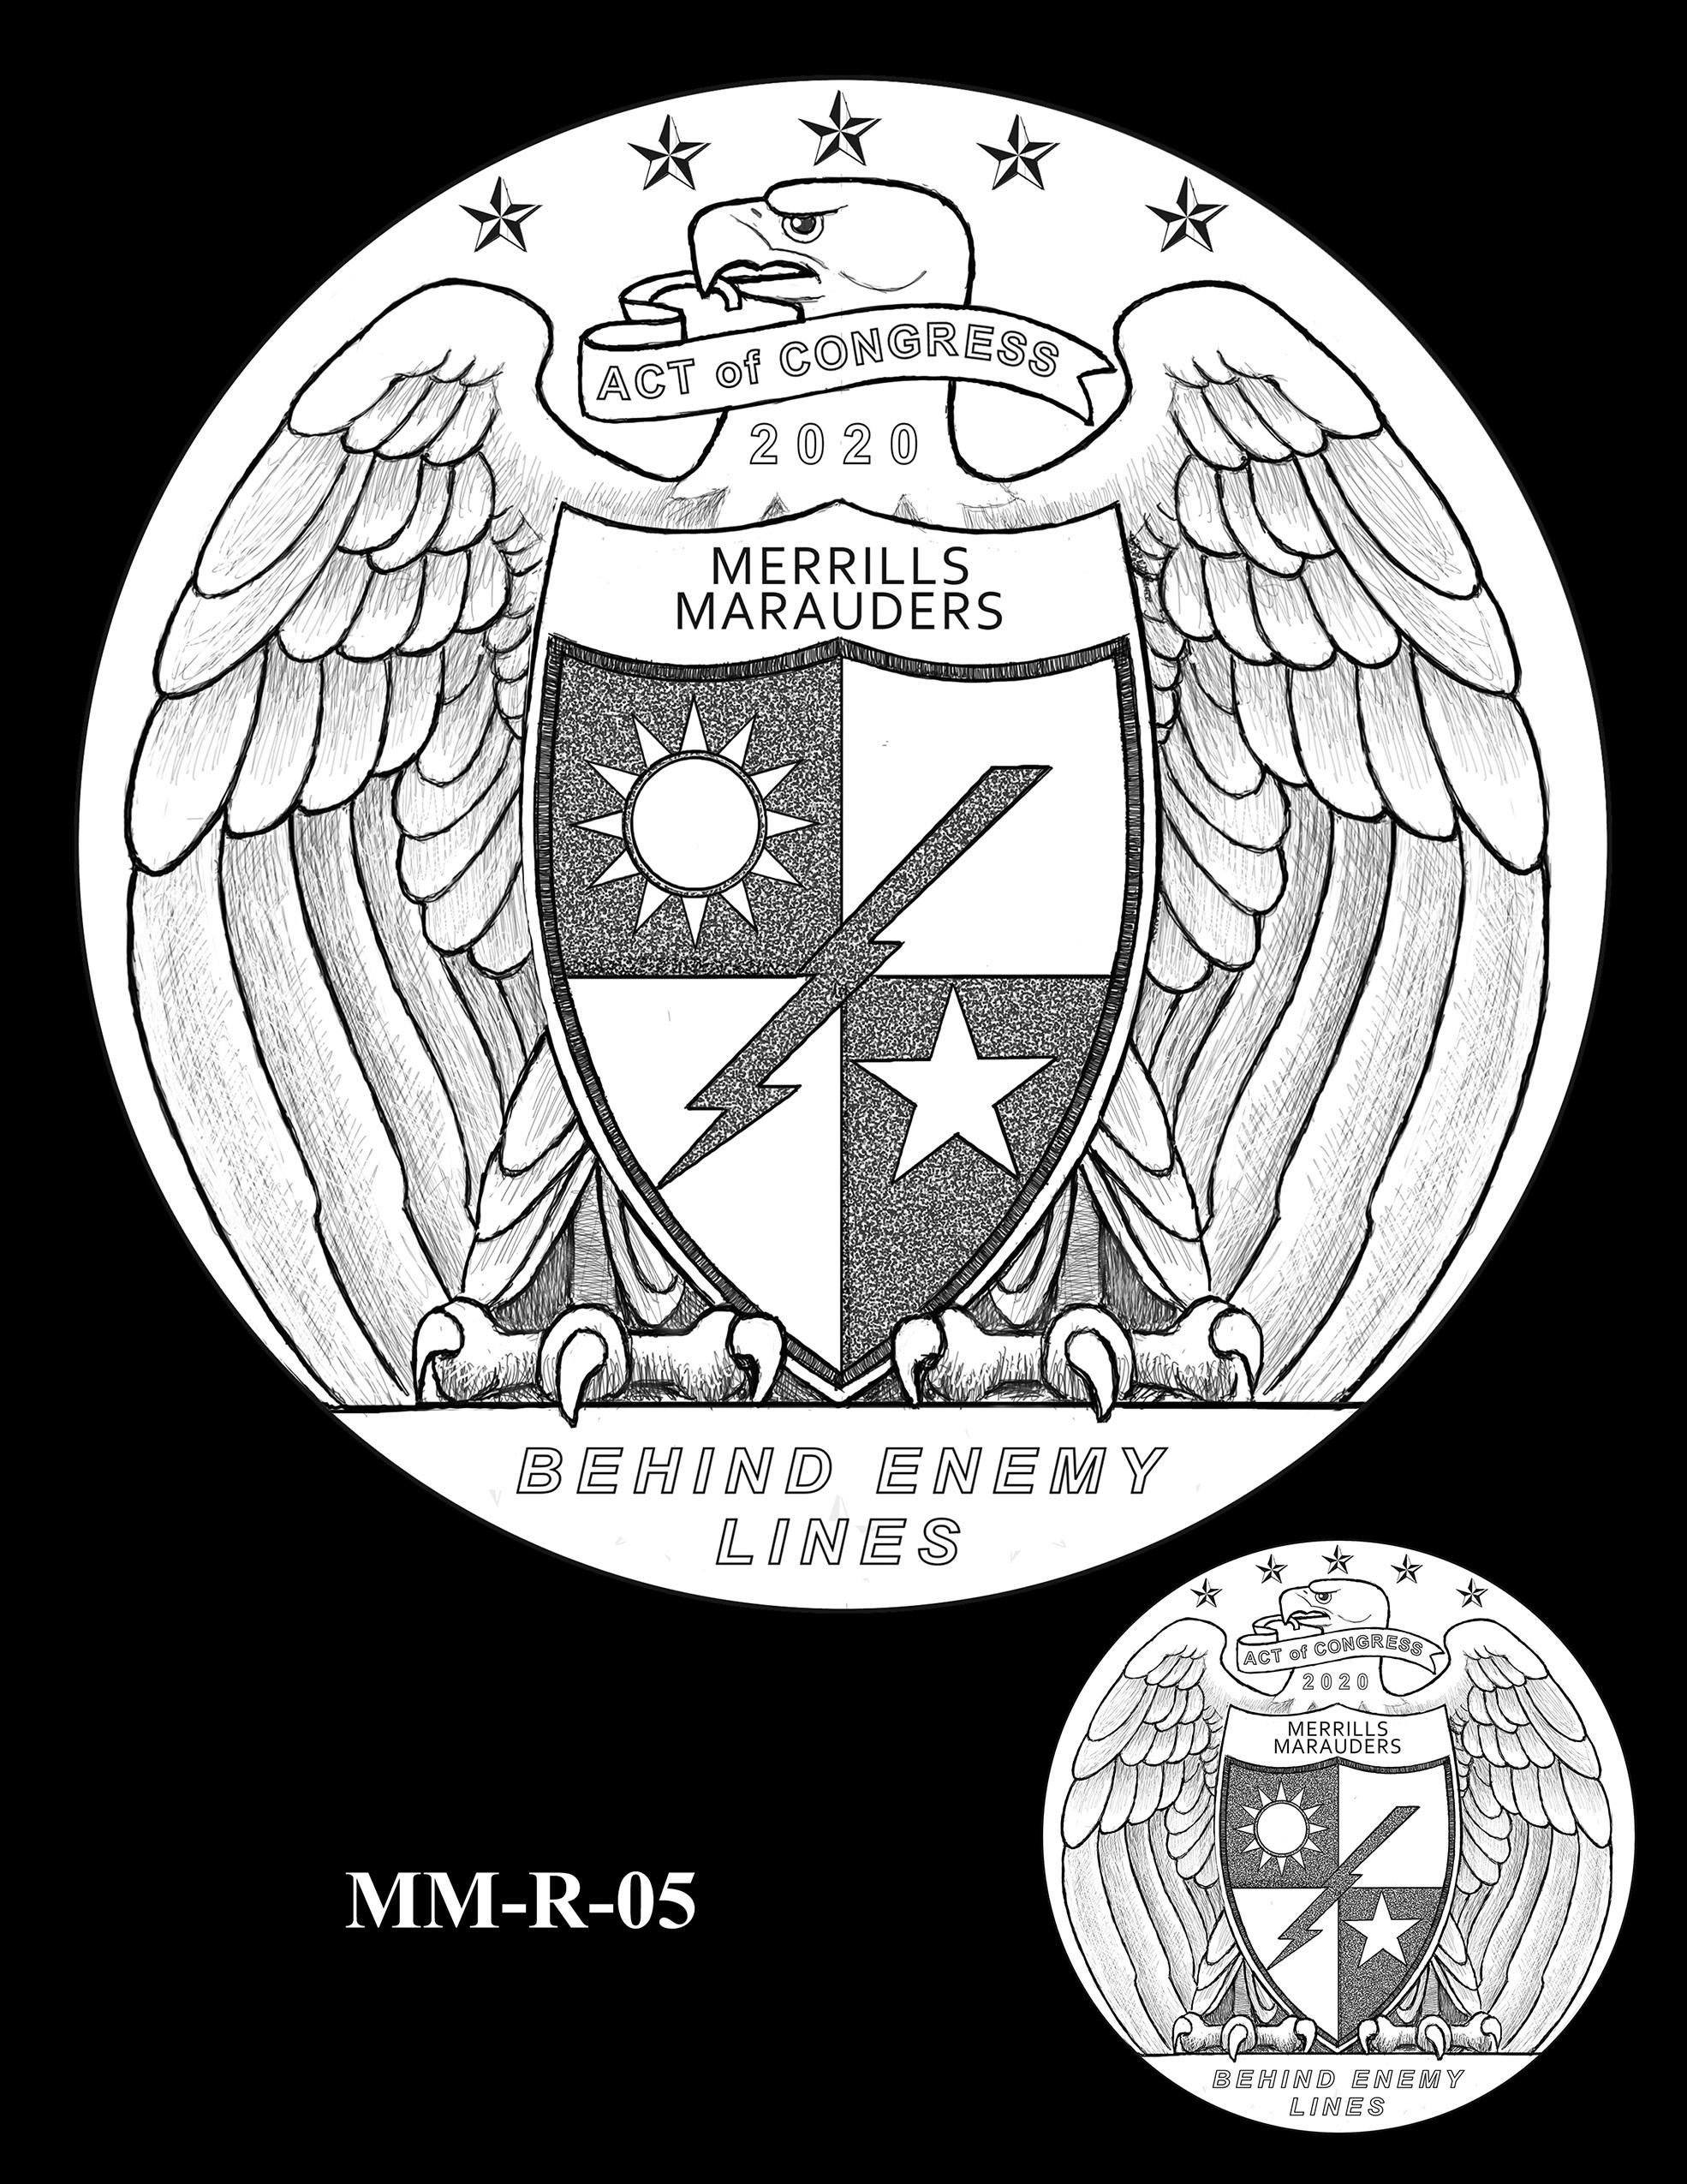 MM-R-05 -- Merrill's Marauders Congressional Gold Medal